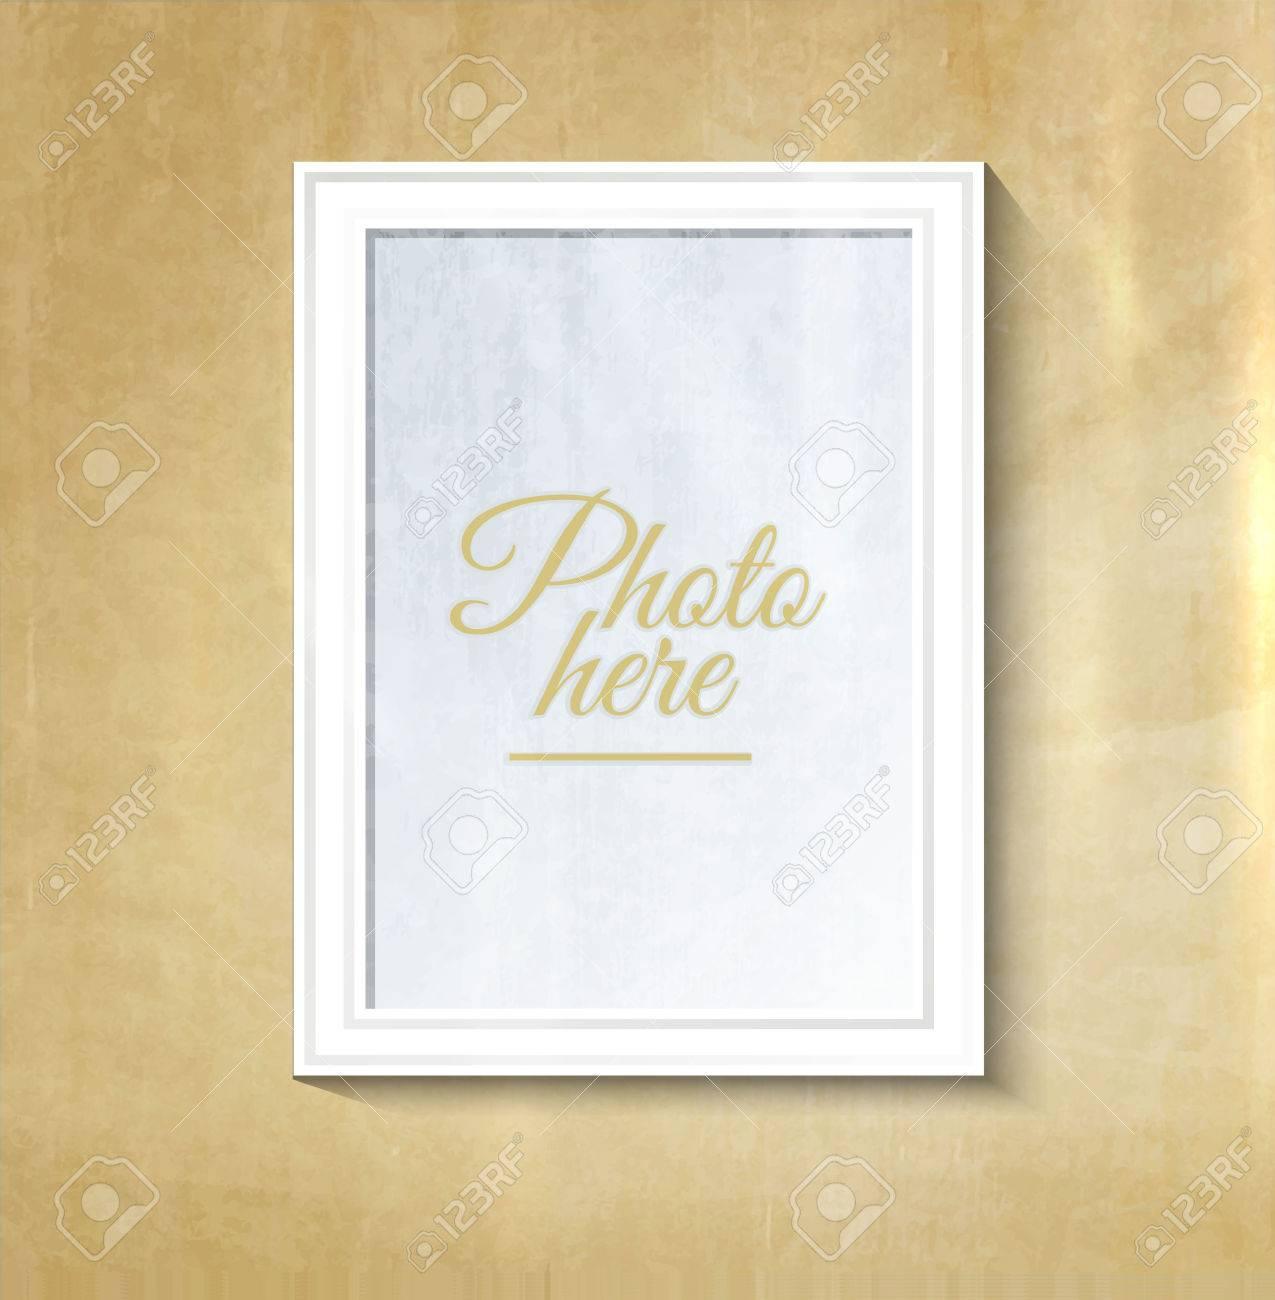 Decorative Collage Photo Frame. Vintage Photo Frame Template ...